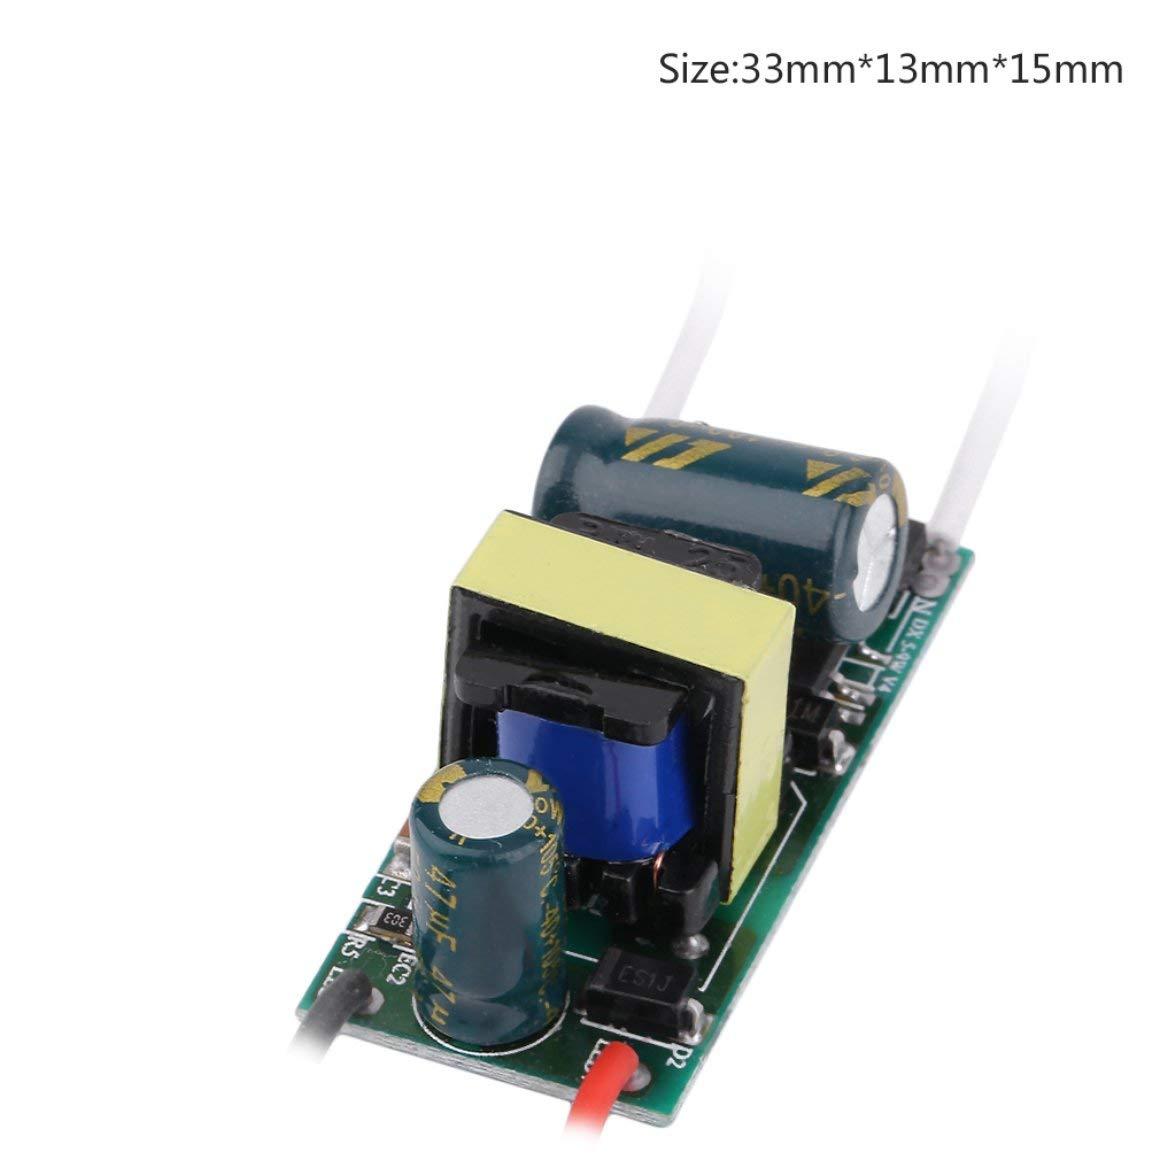 Funnyrunstore Professional Controlador de Placa Base no Resistente al Agua Fuente de alimentaci/ón de Alta Potencia Controlador de Transformador 85-265V180-300mA Tipo: 18-25W // 5/%